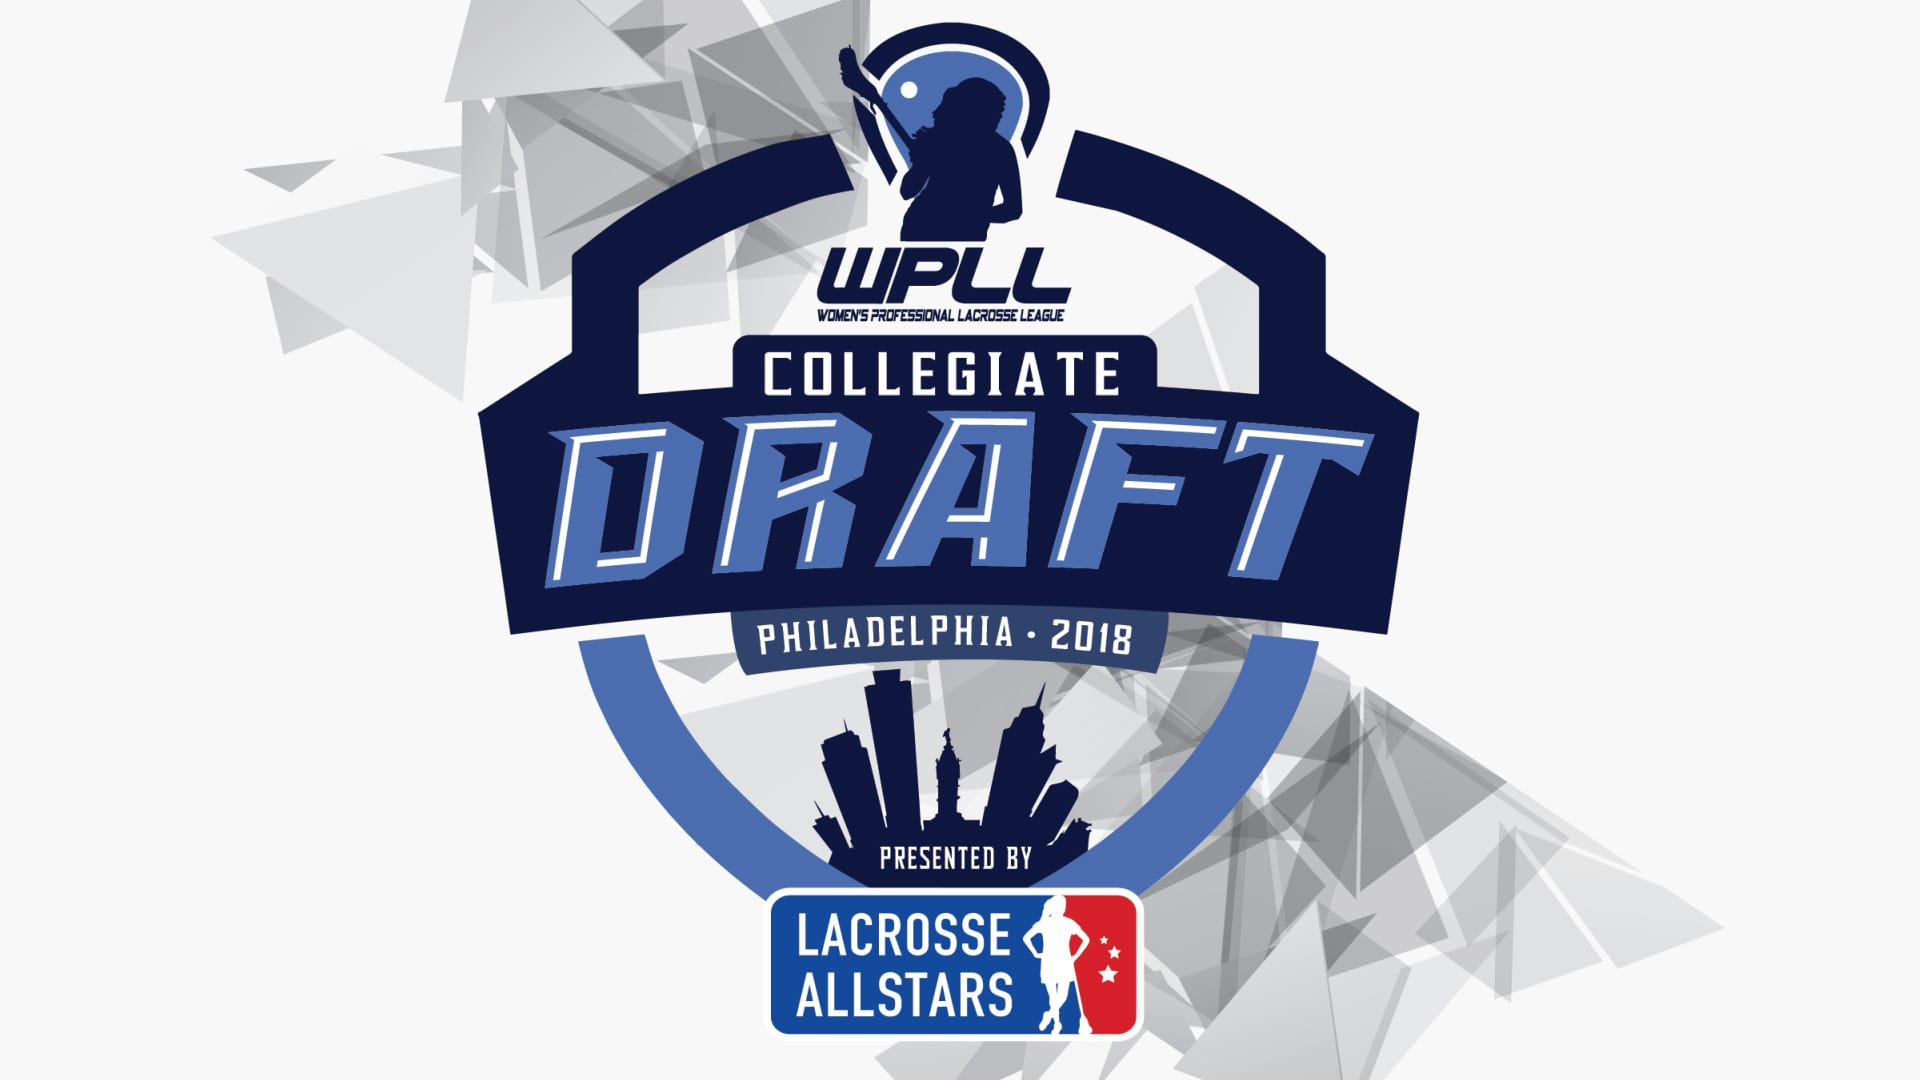 2018 wpll collegiate draft sponsored by Lacrosse All Stars